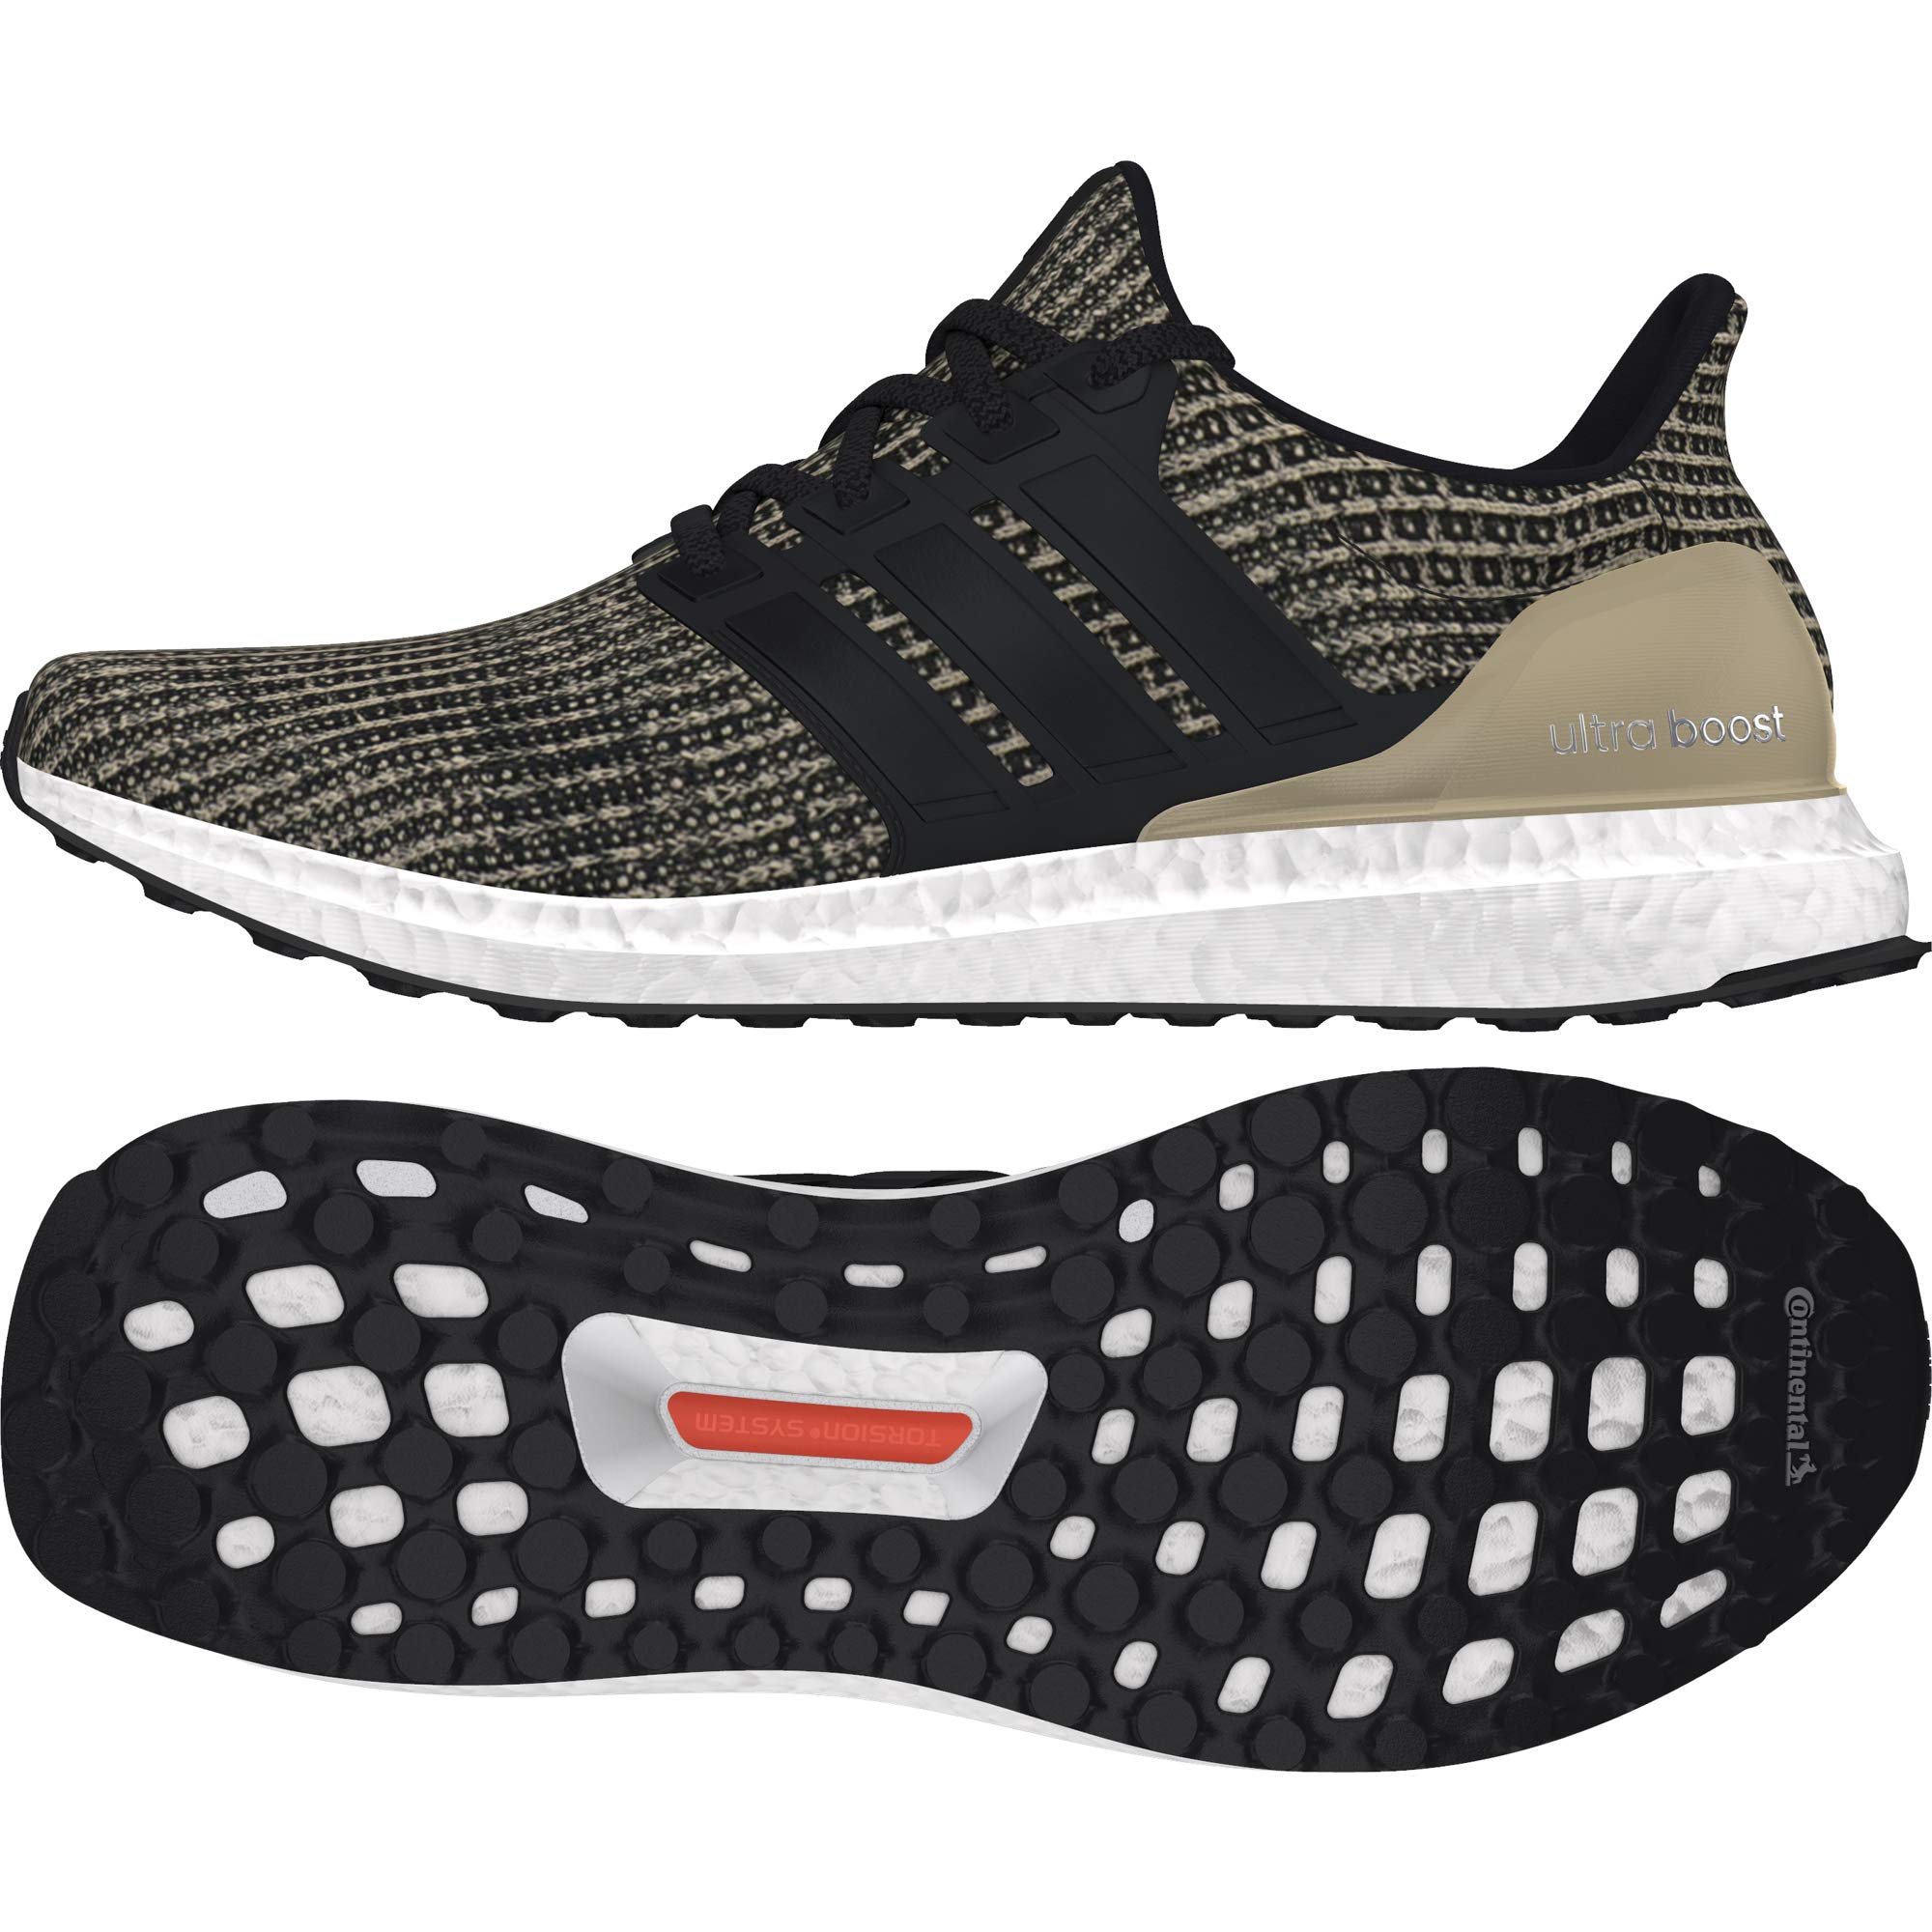 adidas Men's Ultraboost Trail Running